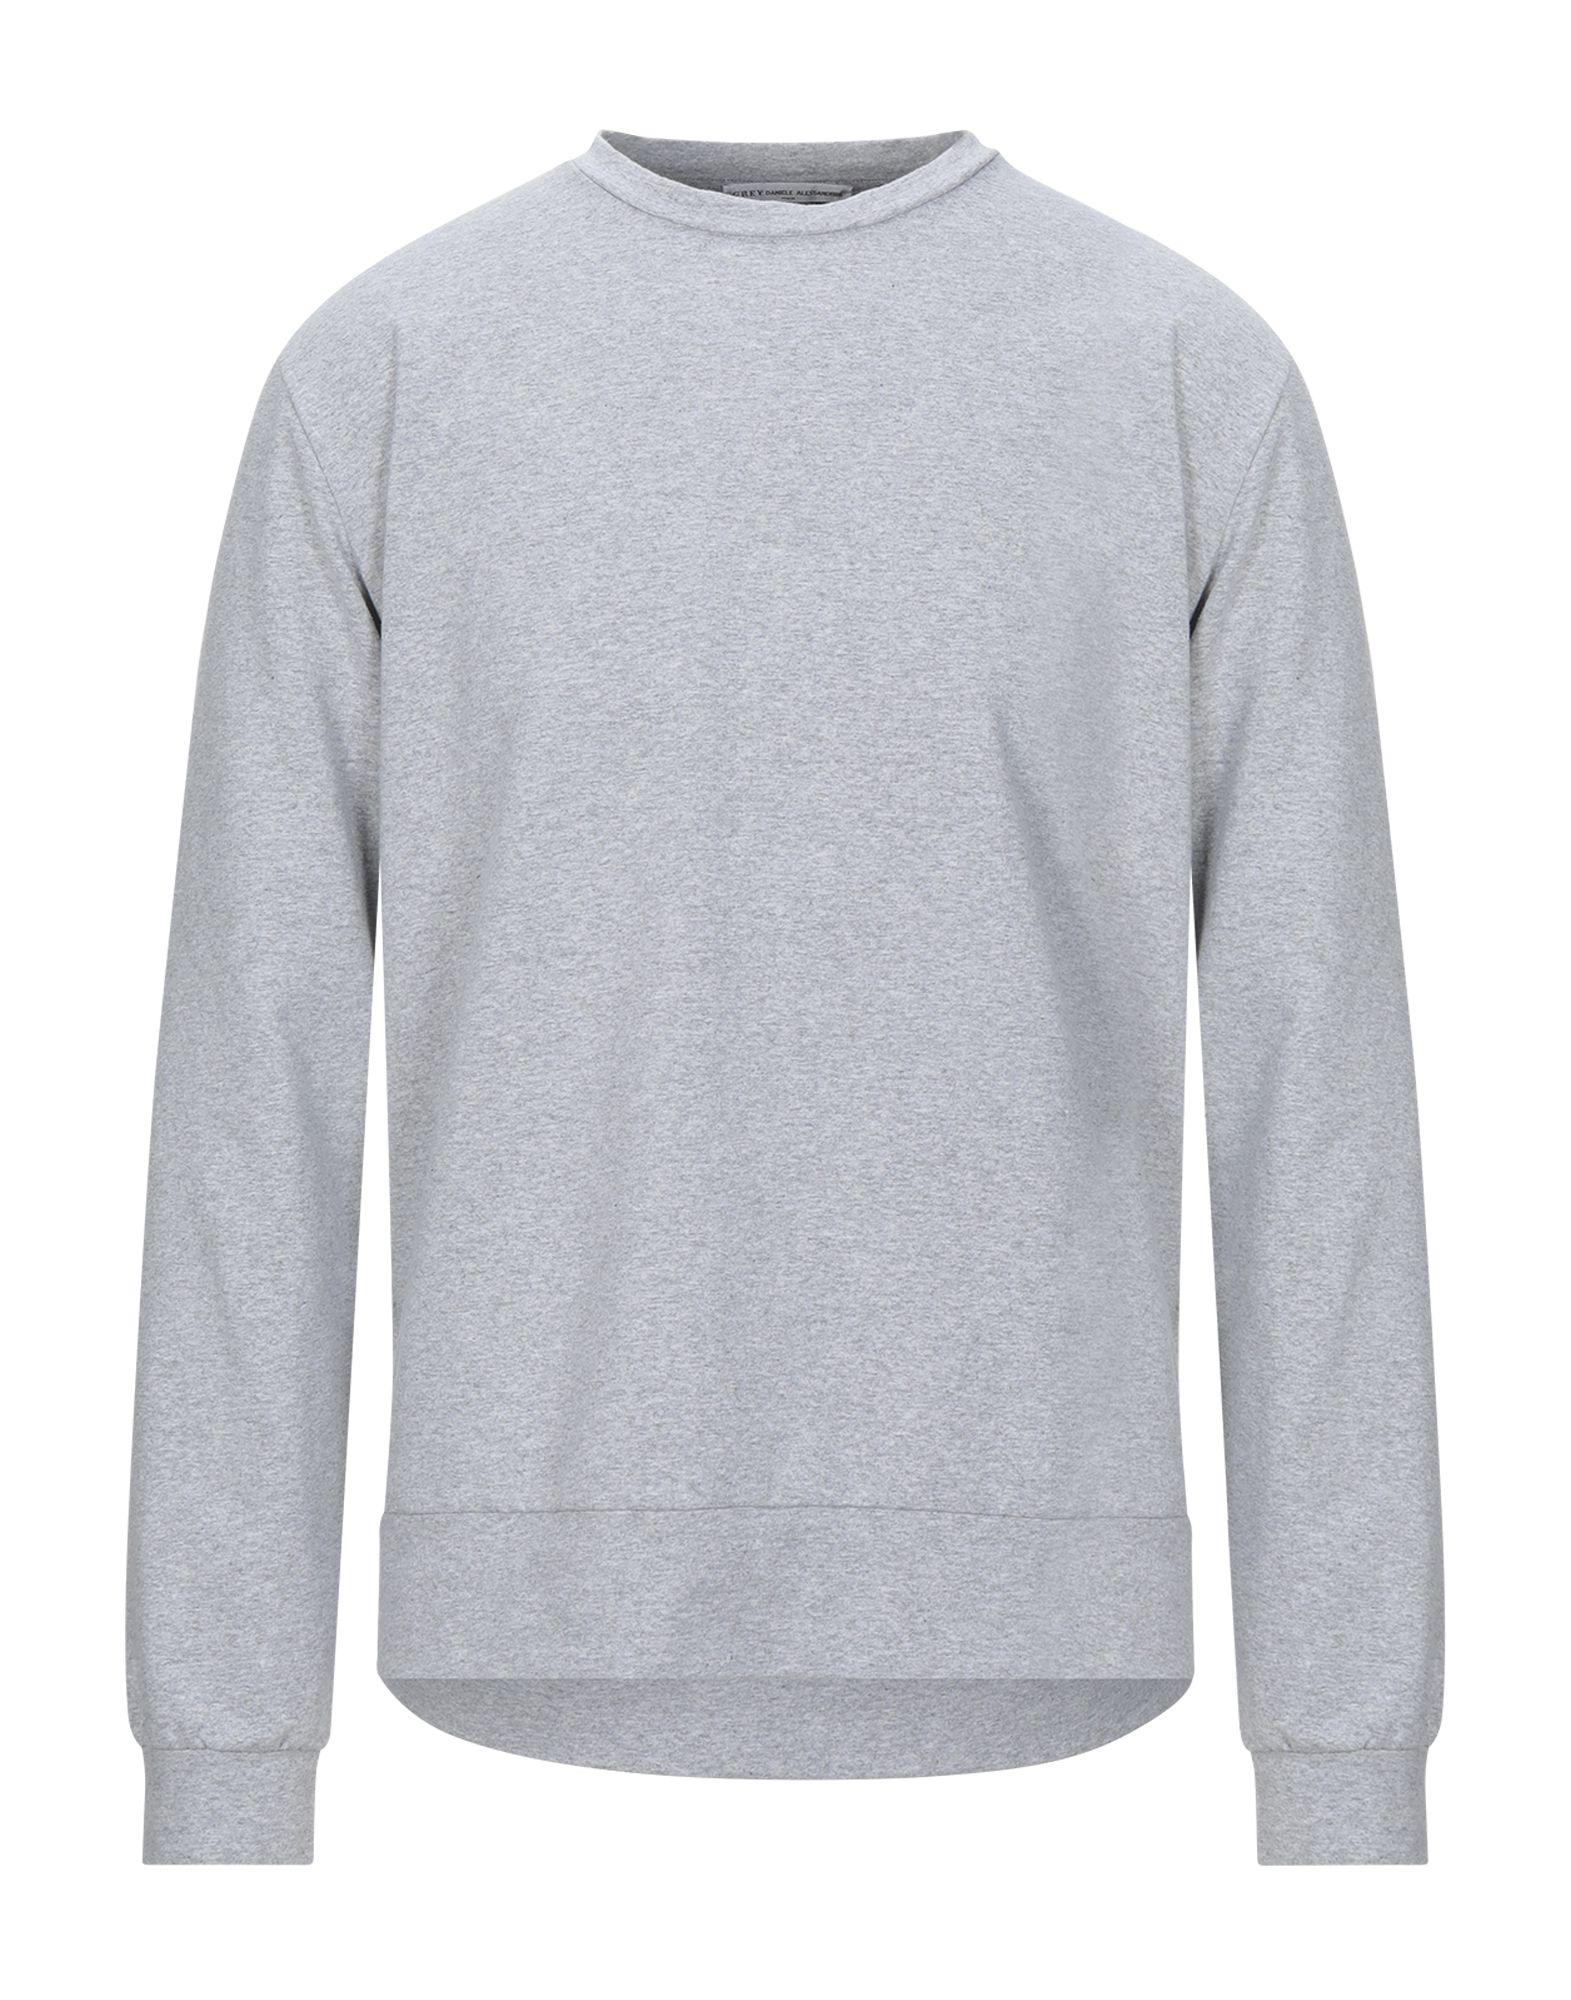 GREY DANIELE ALESSANDRINI Sweatshirts - Item 12443250